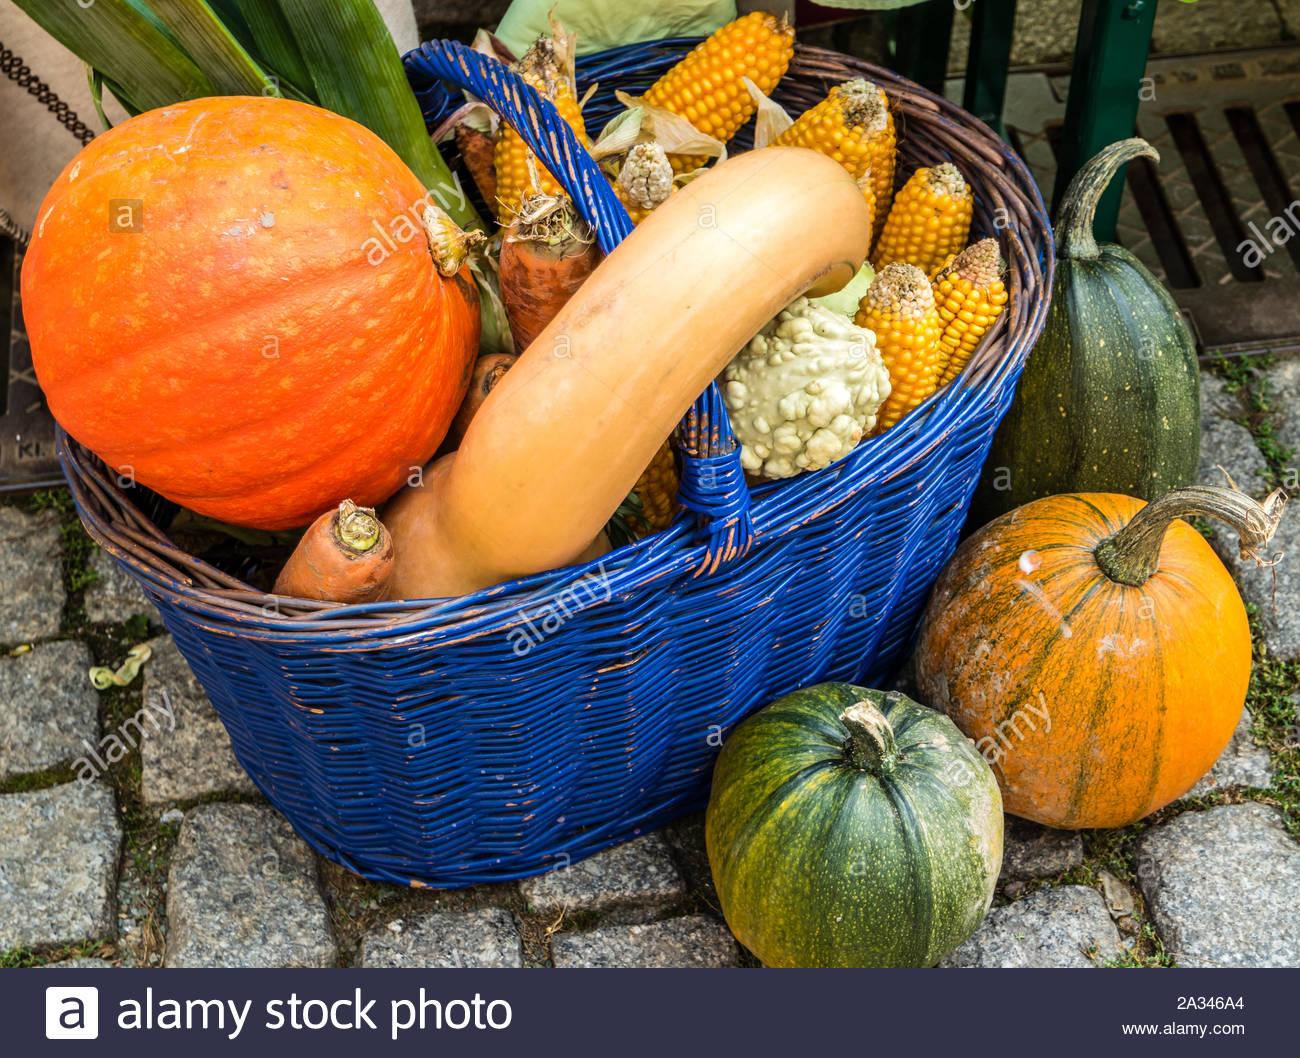 pumpkin basket deco 2A346A4